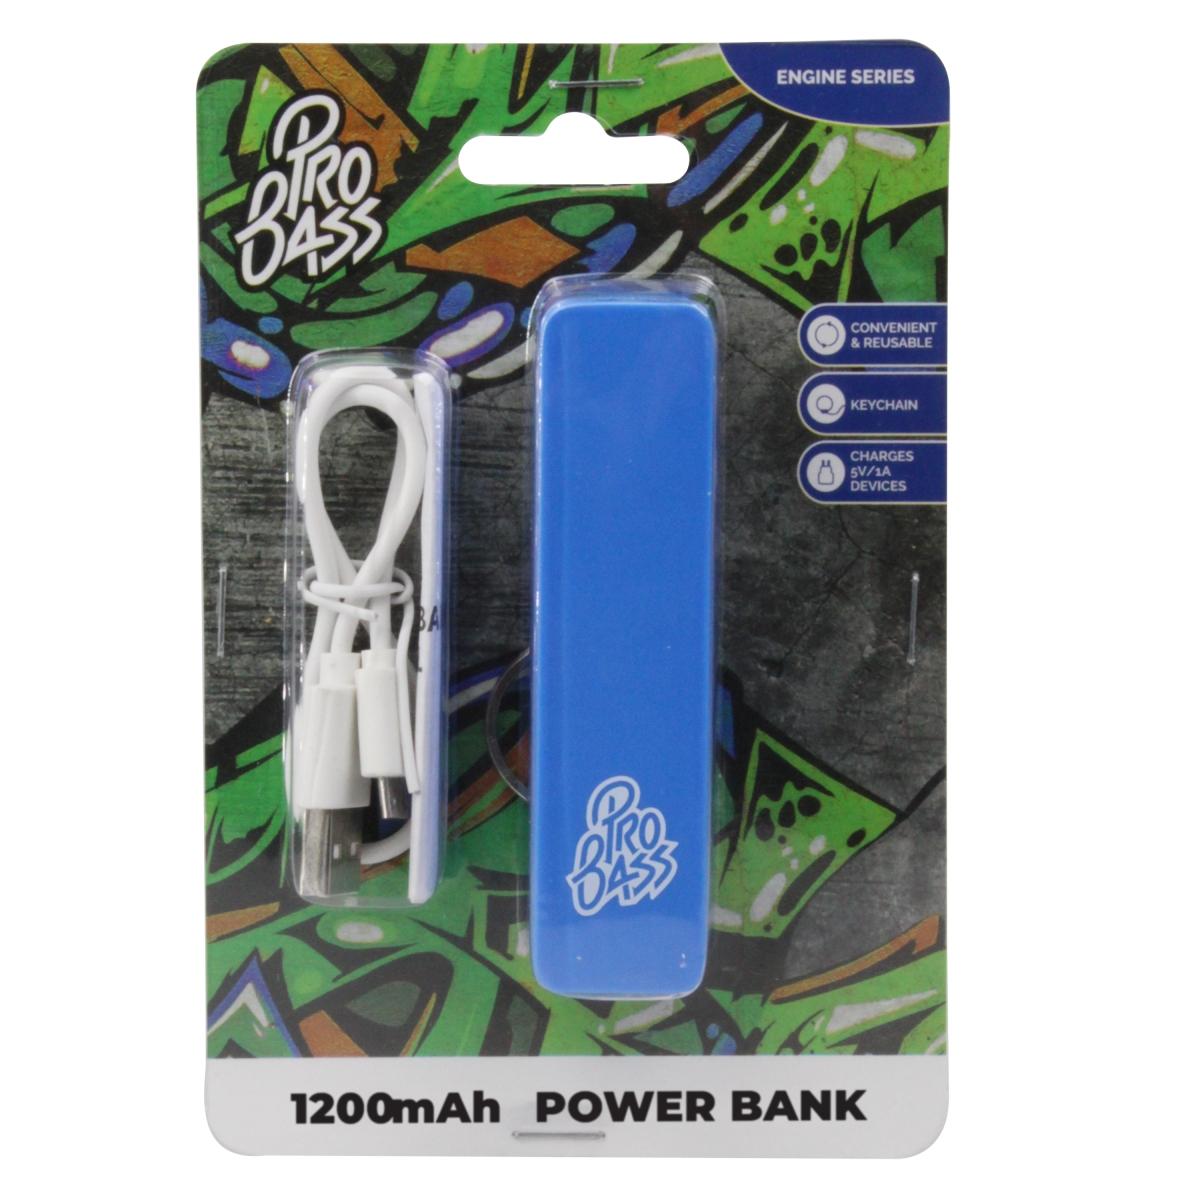 Pro bass engine 1200 mAh power bank